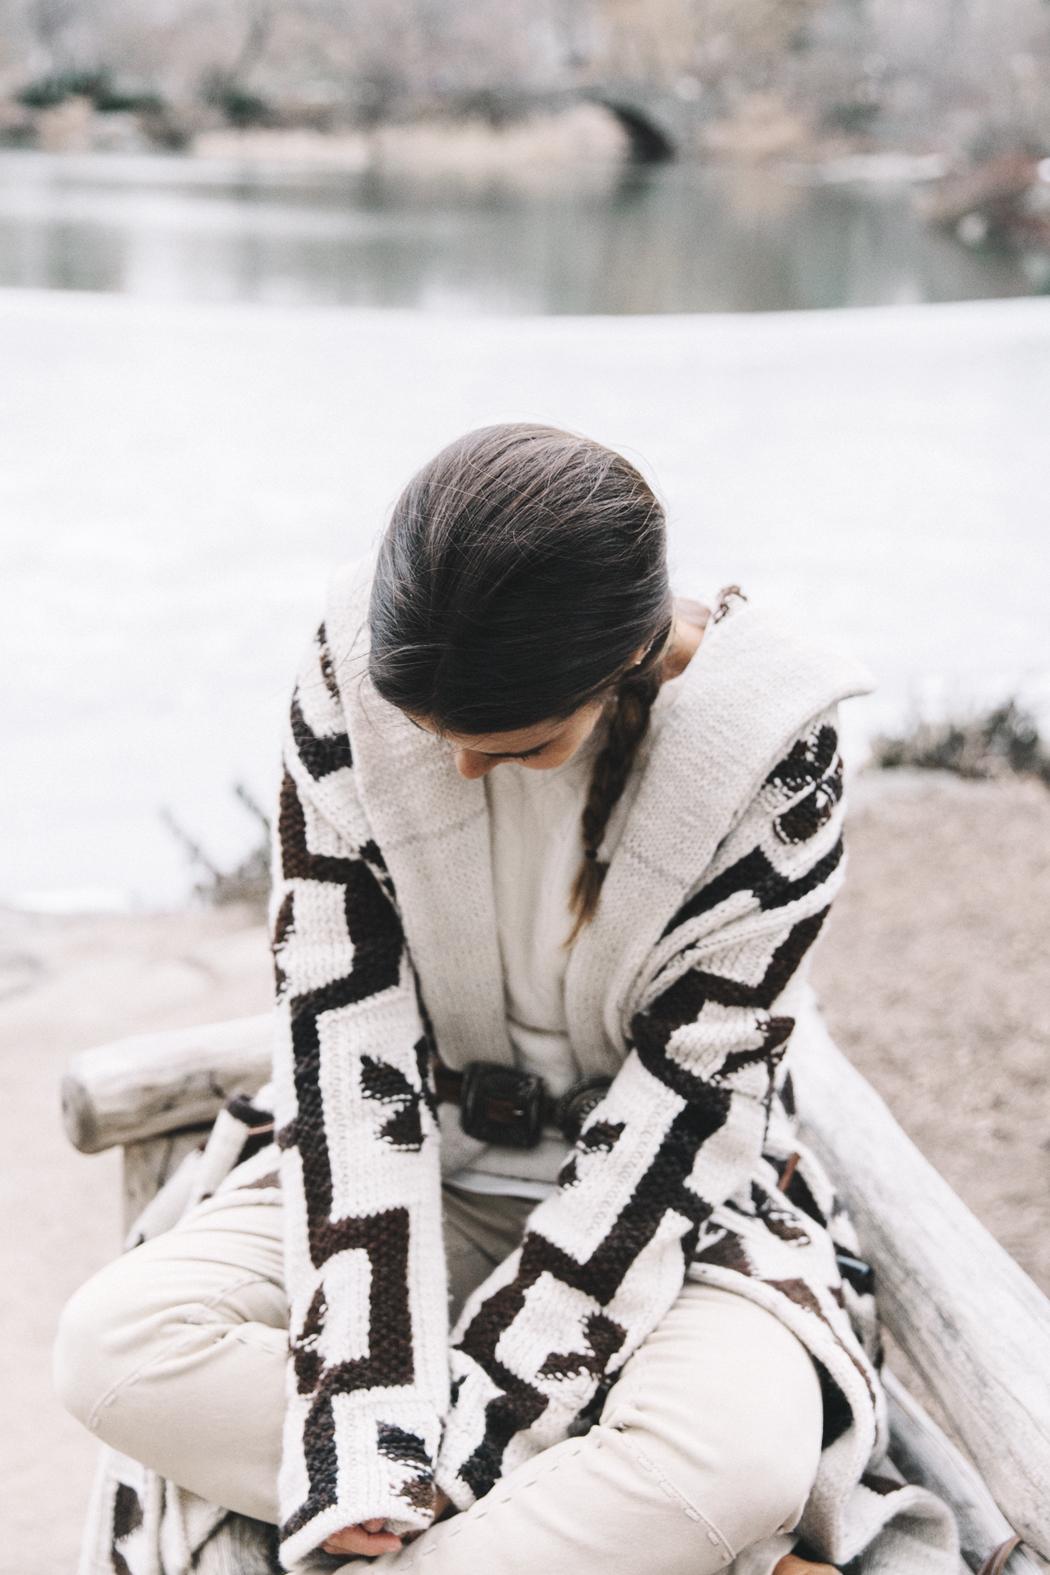 Polo_Ralph_Lauren_Collage_Vintage-Street_Style-NYFW-New_York_Fashion_Week-Knit_Jacket-Cream_Trousers-Boho-Winter_White-4